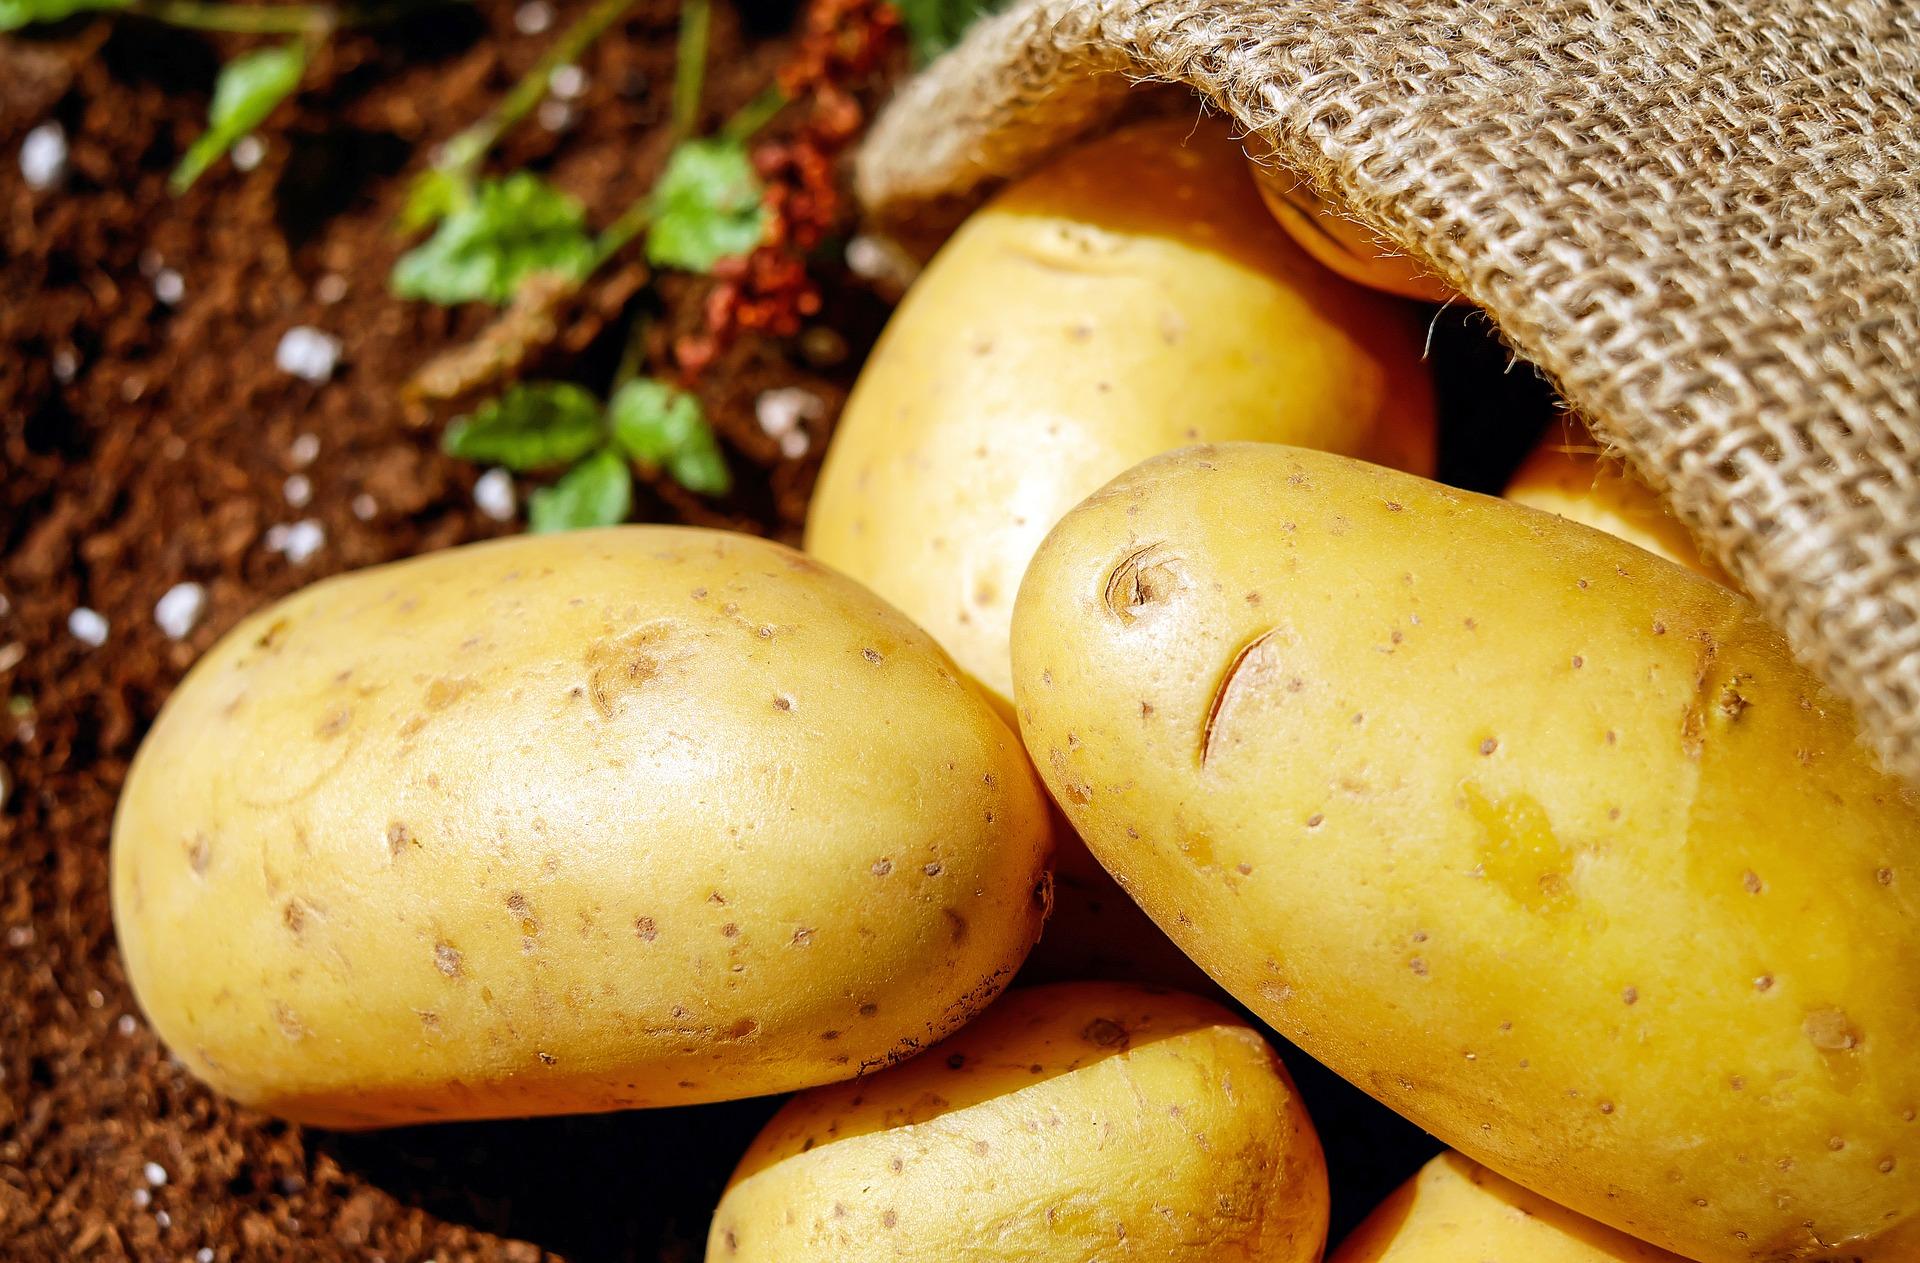 le patate lesse ingrassano